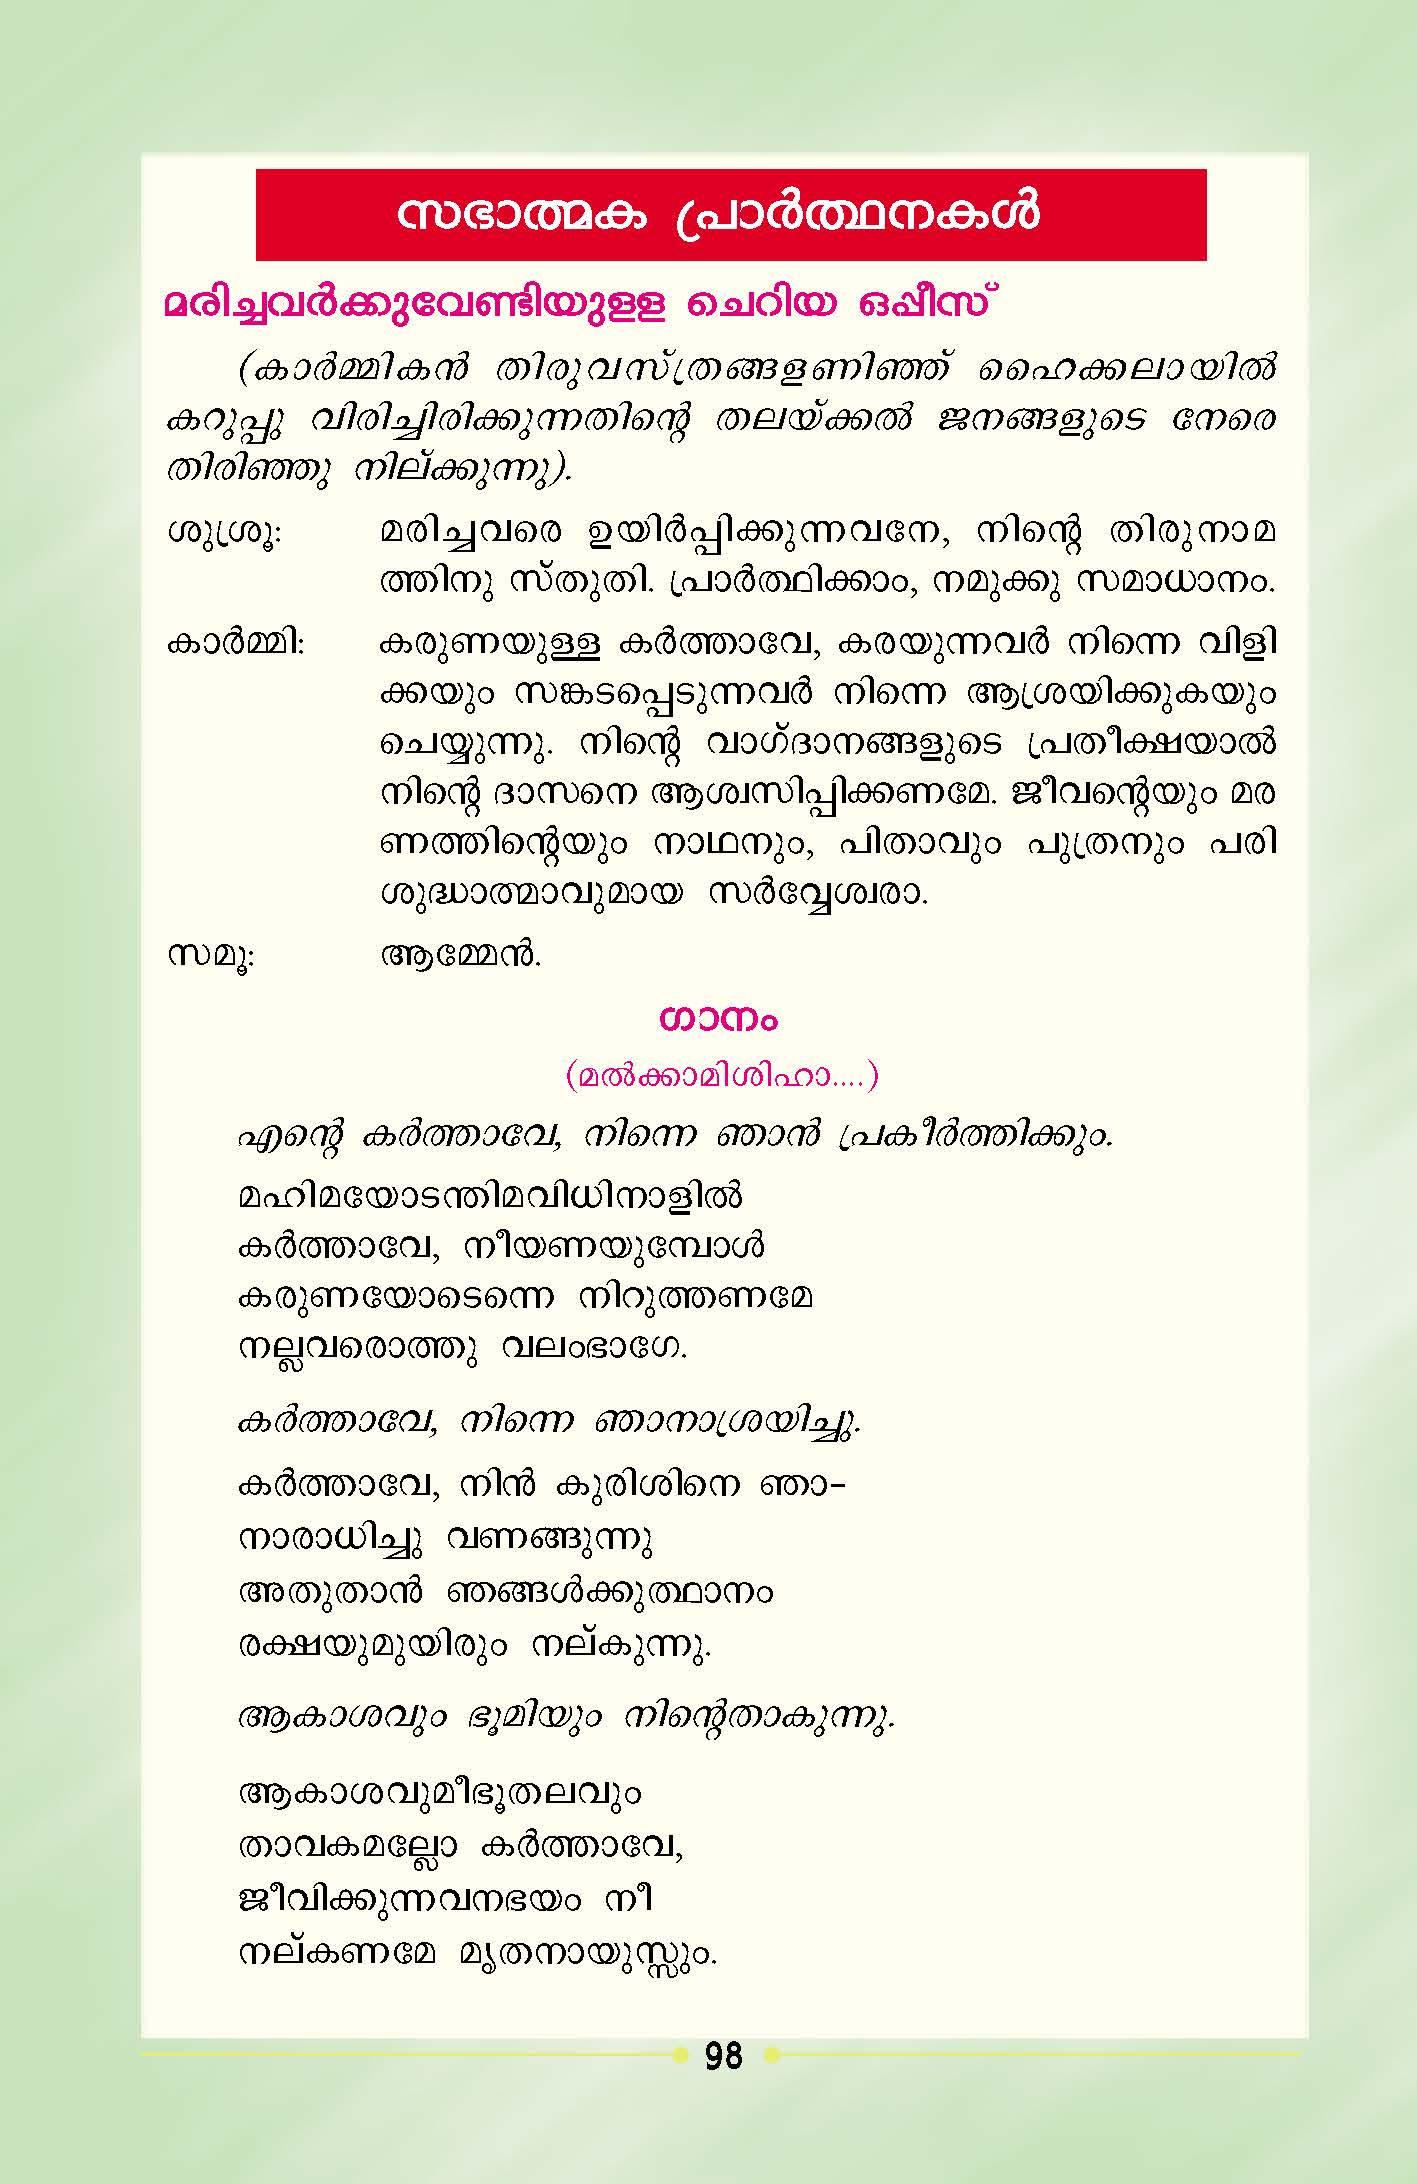 Cheriya Oppesu Office for the Dead (Malayalam) 01